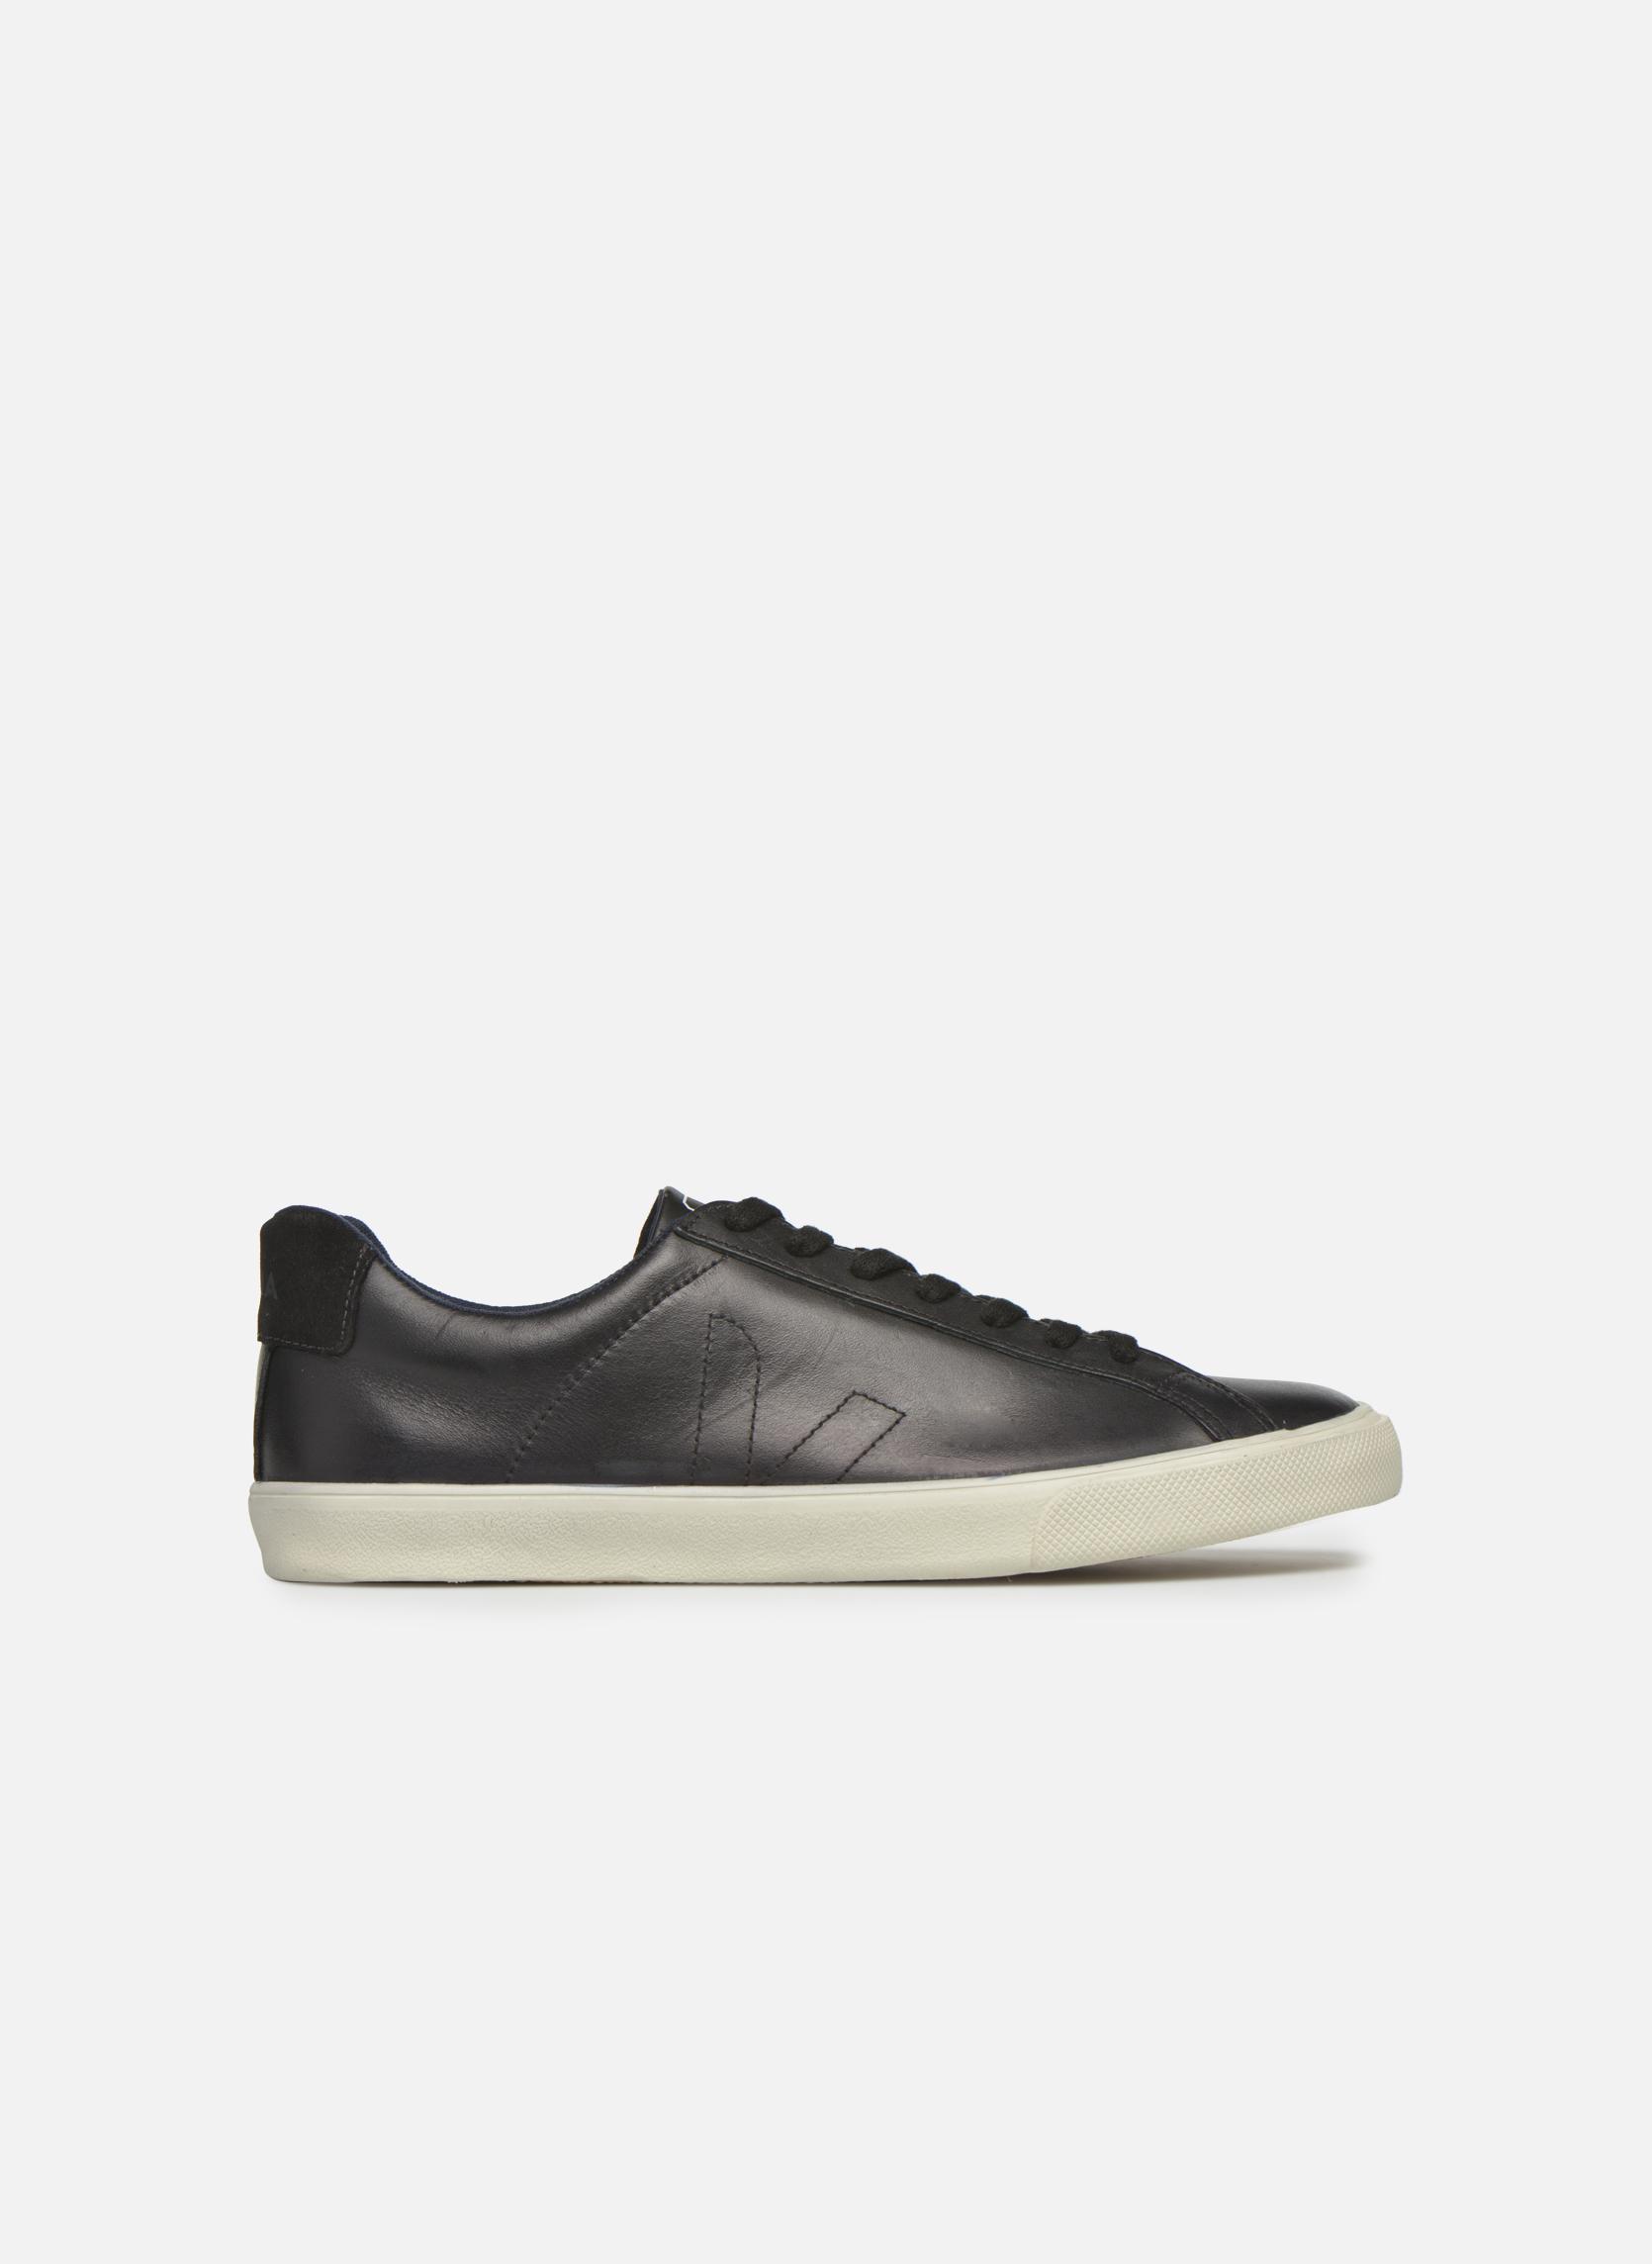 Baskets Veja Esplar Leather Noir vue derrière